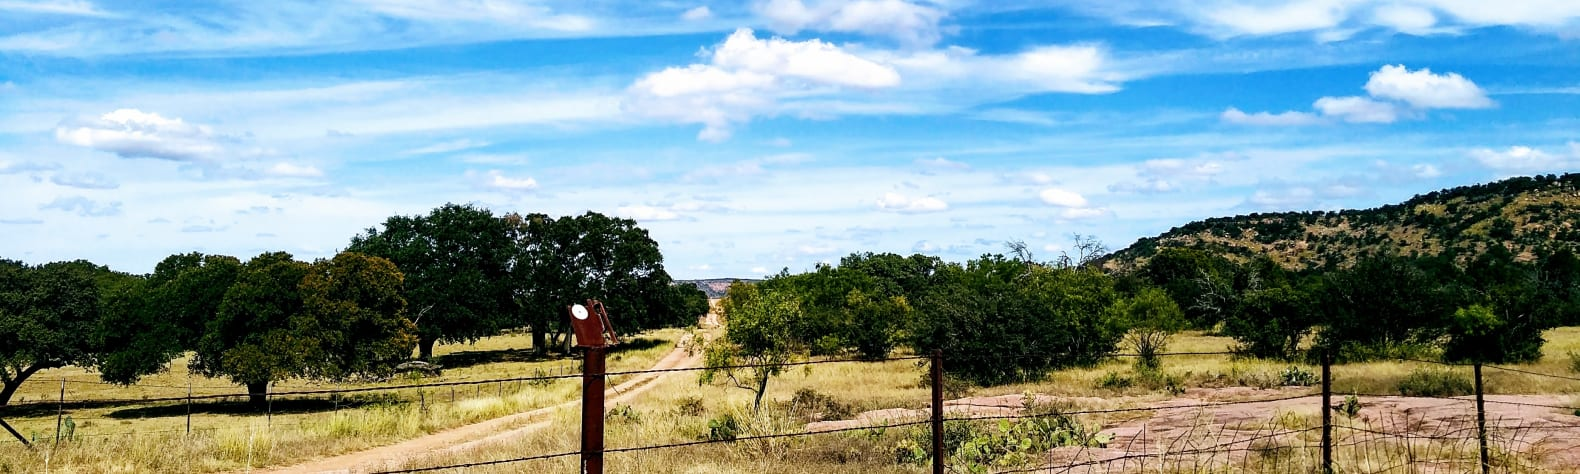 Maggi W.'s Land